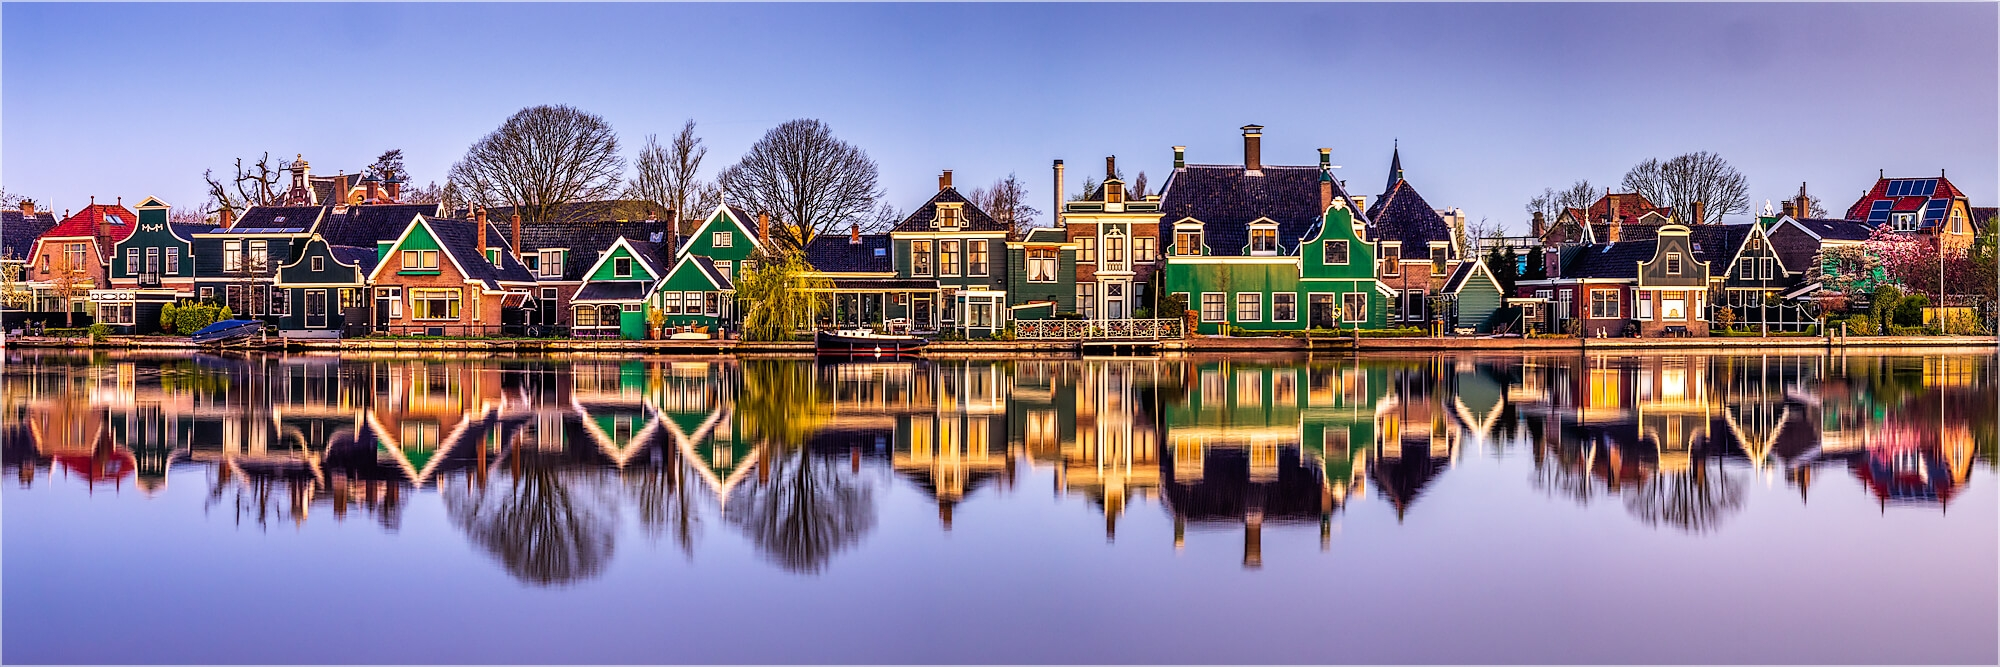 Panoramabild Häuserzeile Zaandam Holland